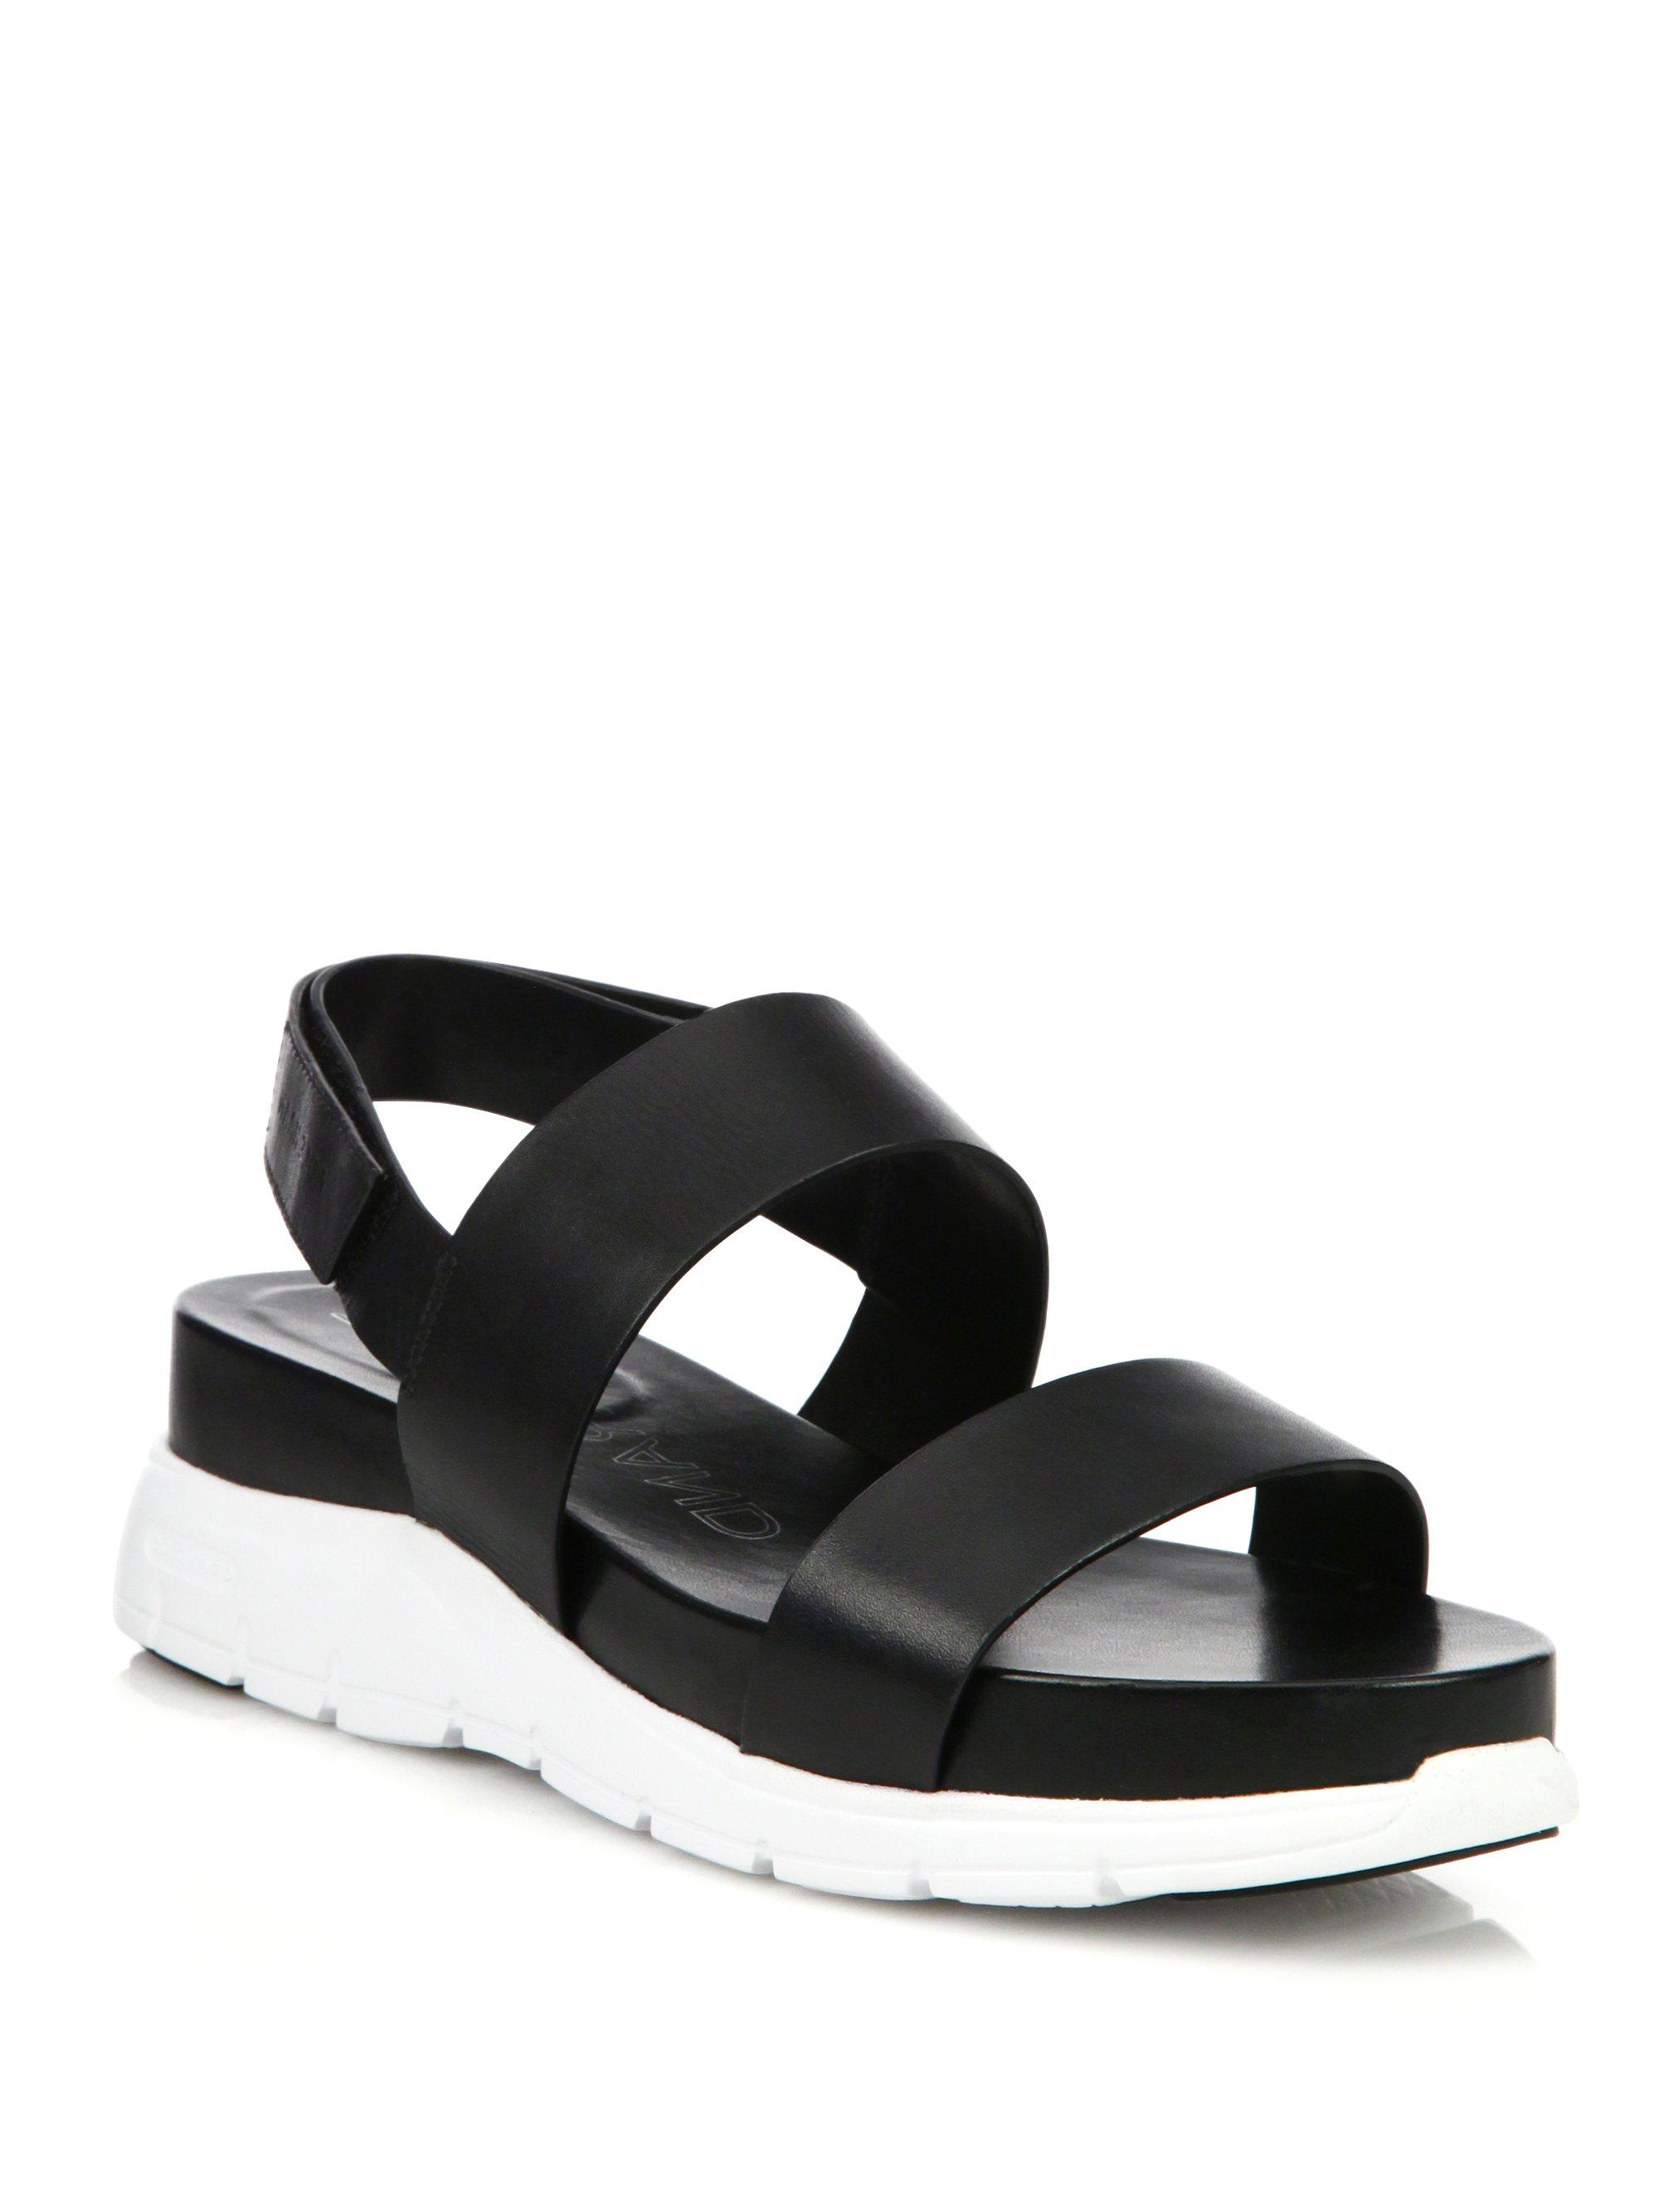 Cole Haan Zerogrand Leather Sandals qAD9RcJky4